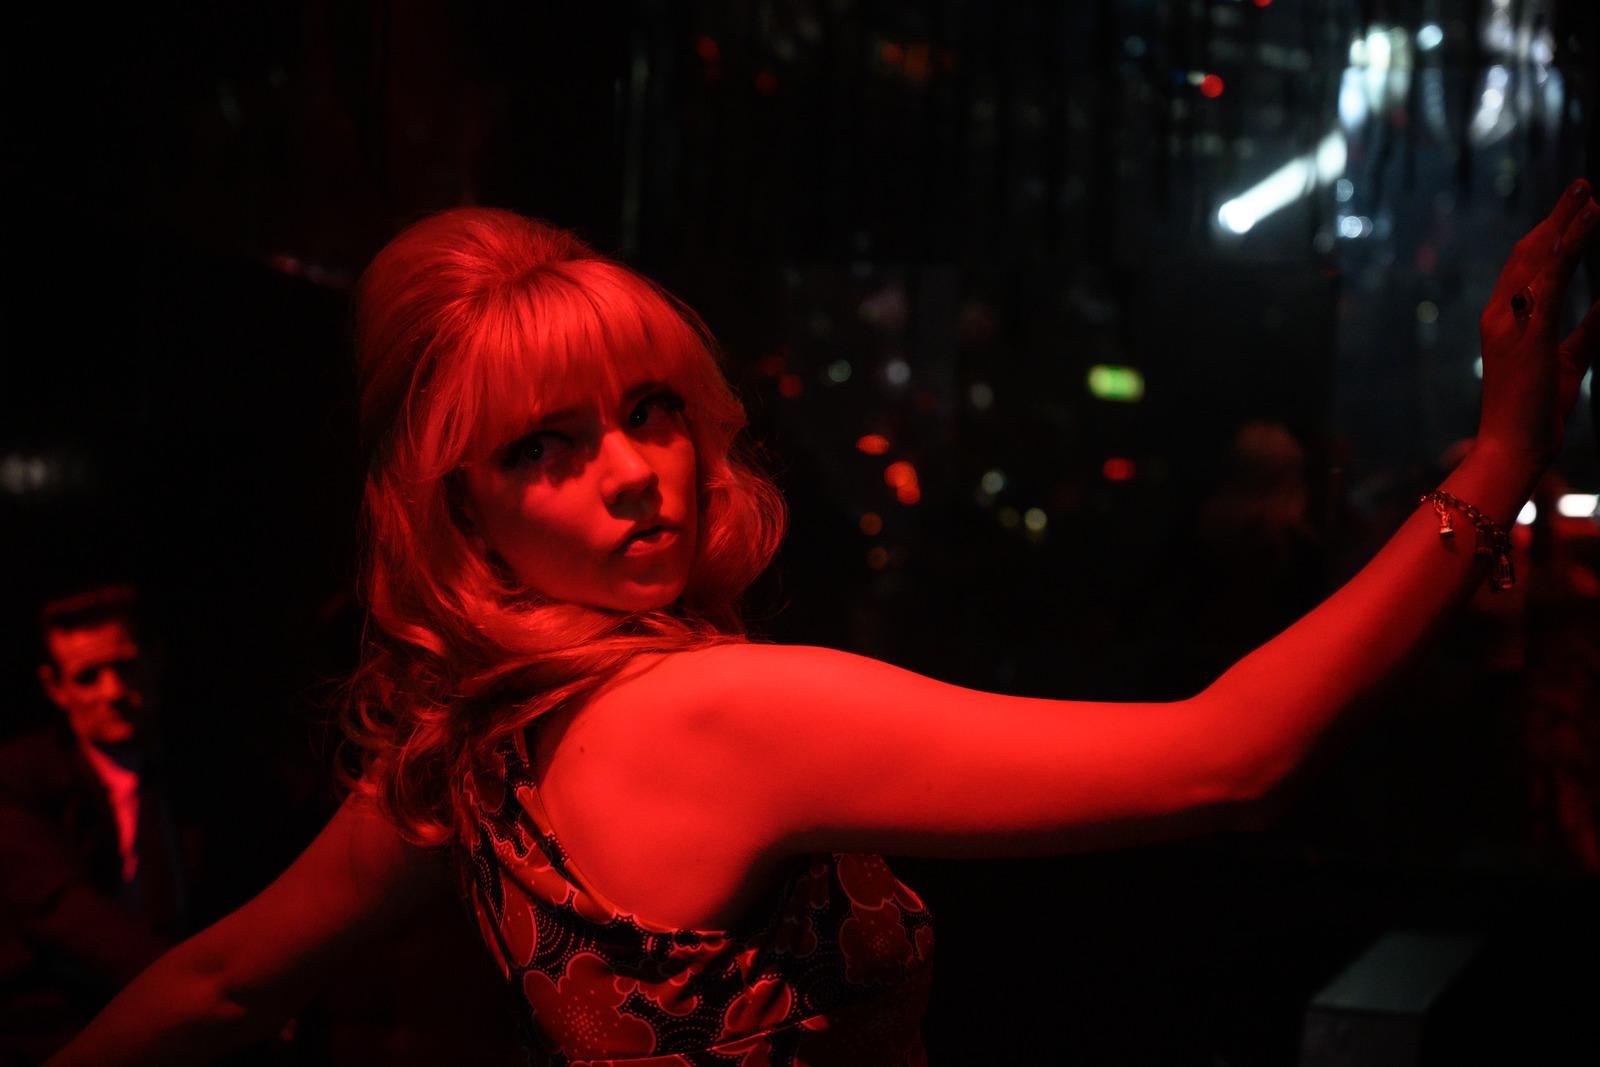 Anya Taylor-Joy in 'Last Night in Soho'